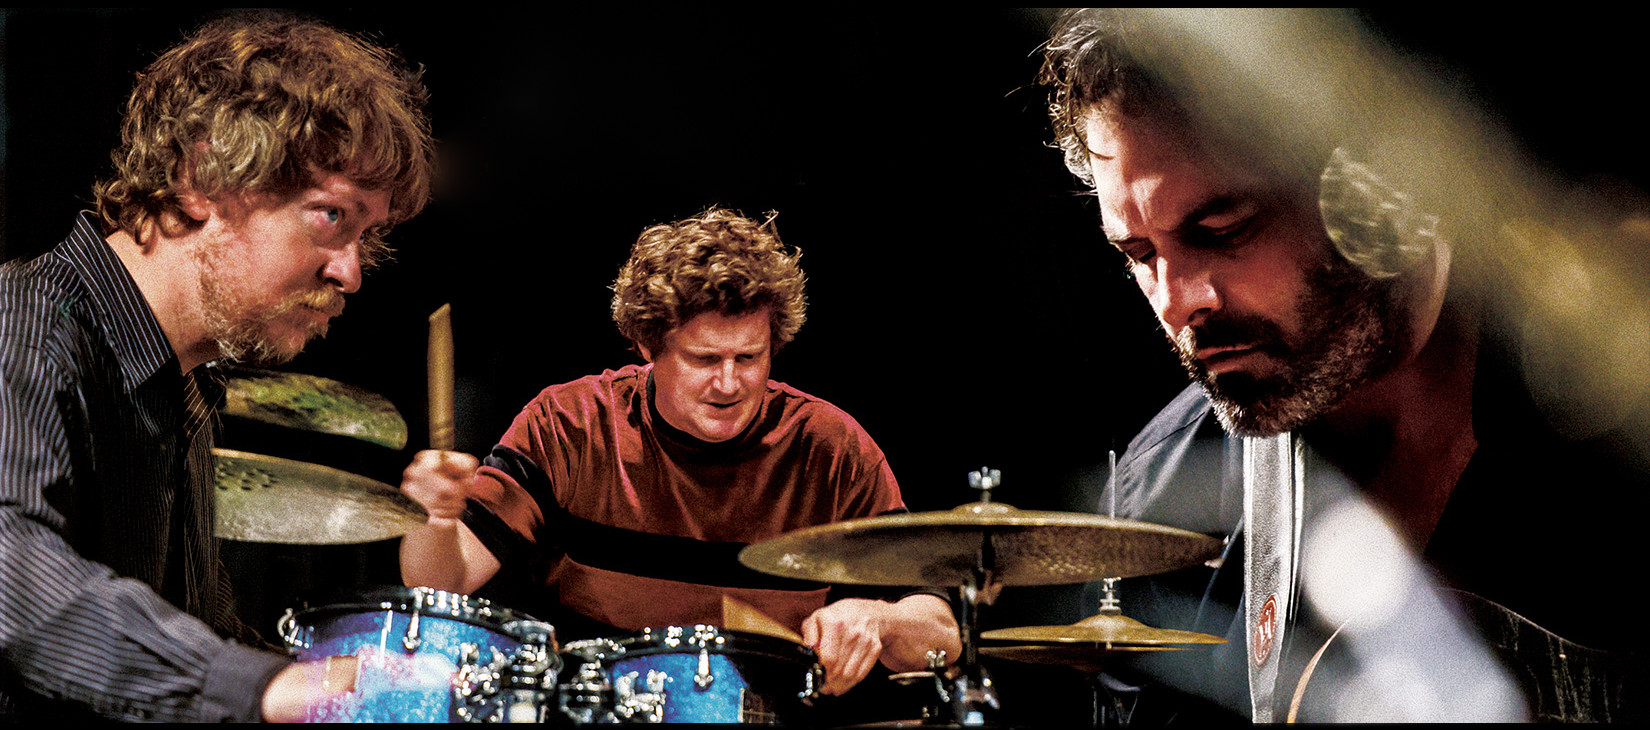 Gordon_Grdina's_Nomad_Trio_Photo_by_Jamie_Leigh)Gonzales